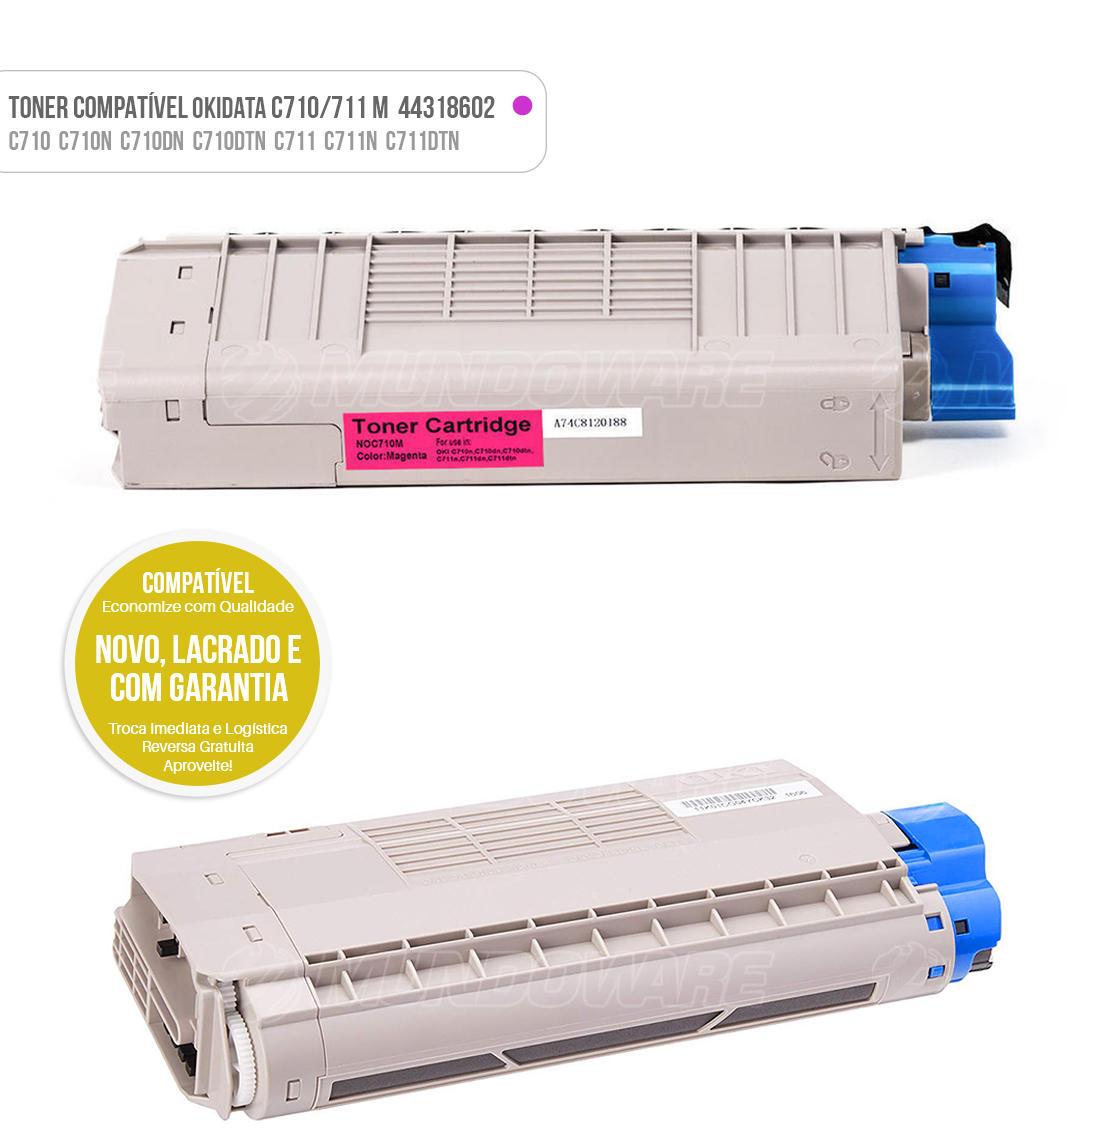 Toner Magenta Compatível para impressora Okidata C710 C710N C710DN C710DTN C711 C711N C711DTN Tonner